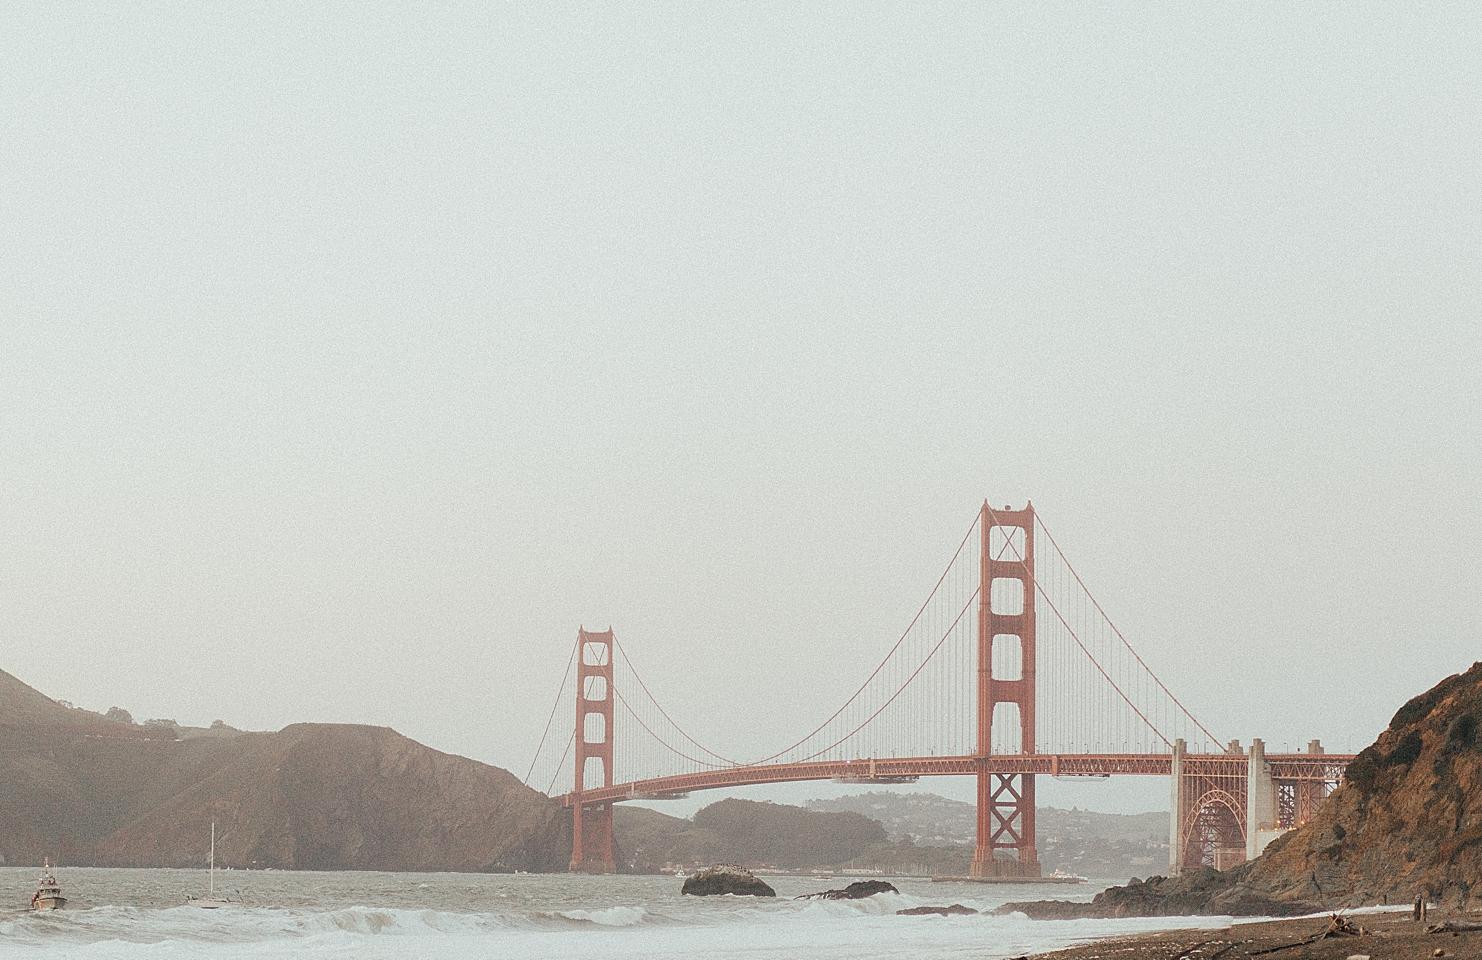 SanFranciscoEngagementPhotographyRachelWakefieldAlexaandJonathanEngagementPhotos(131of131).jpg